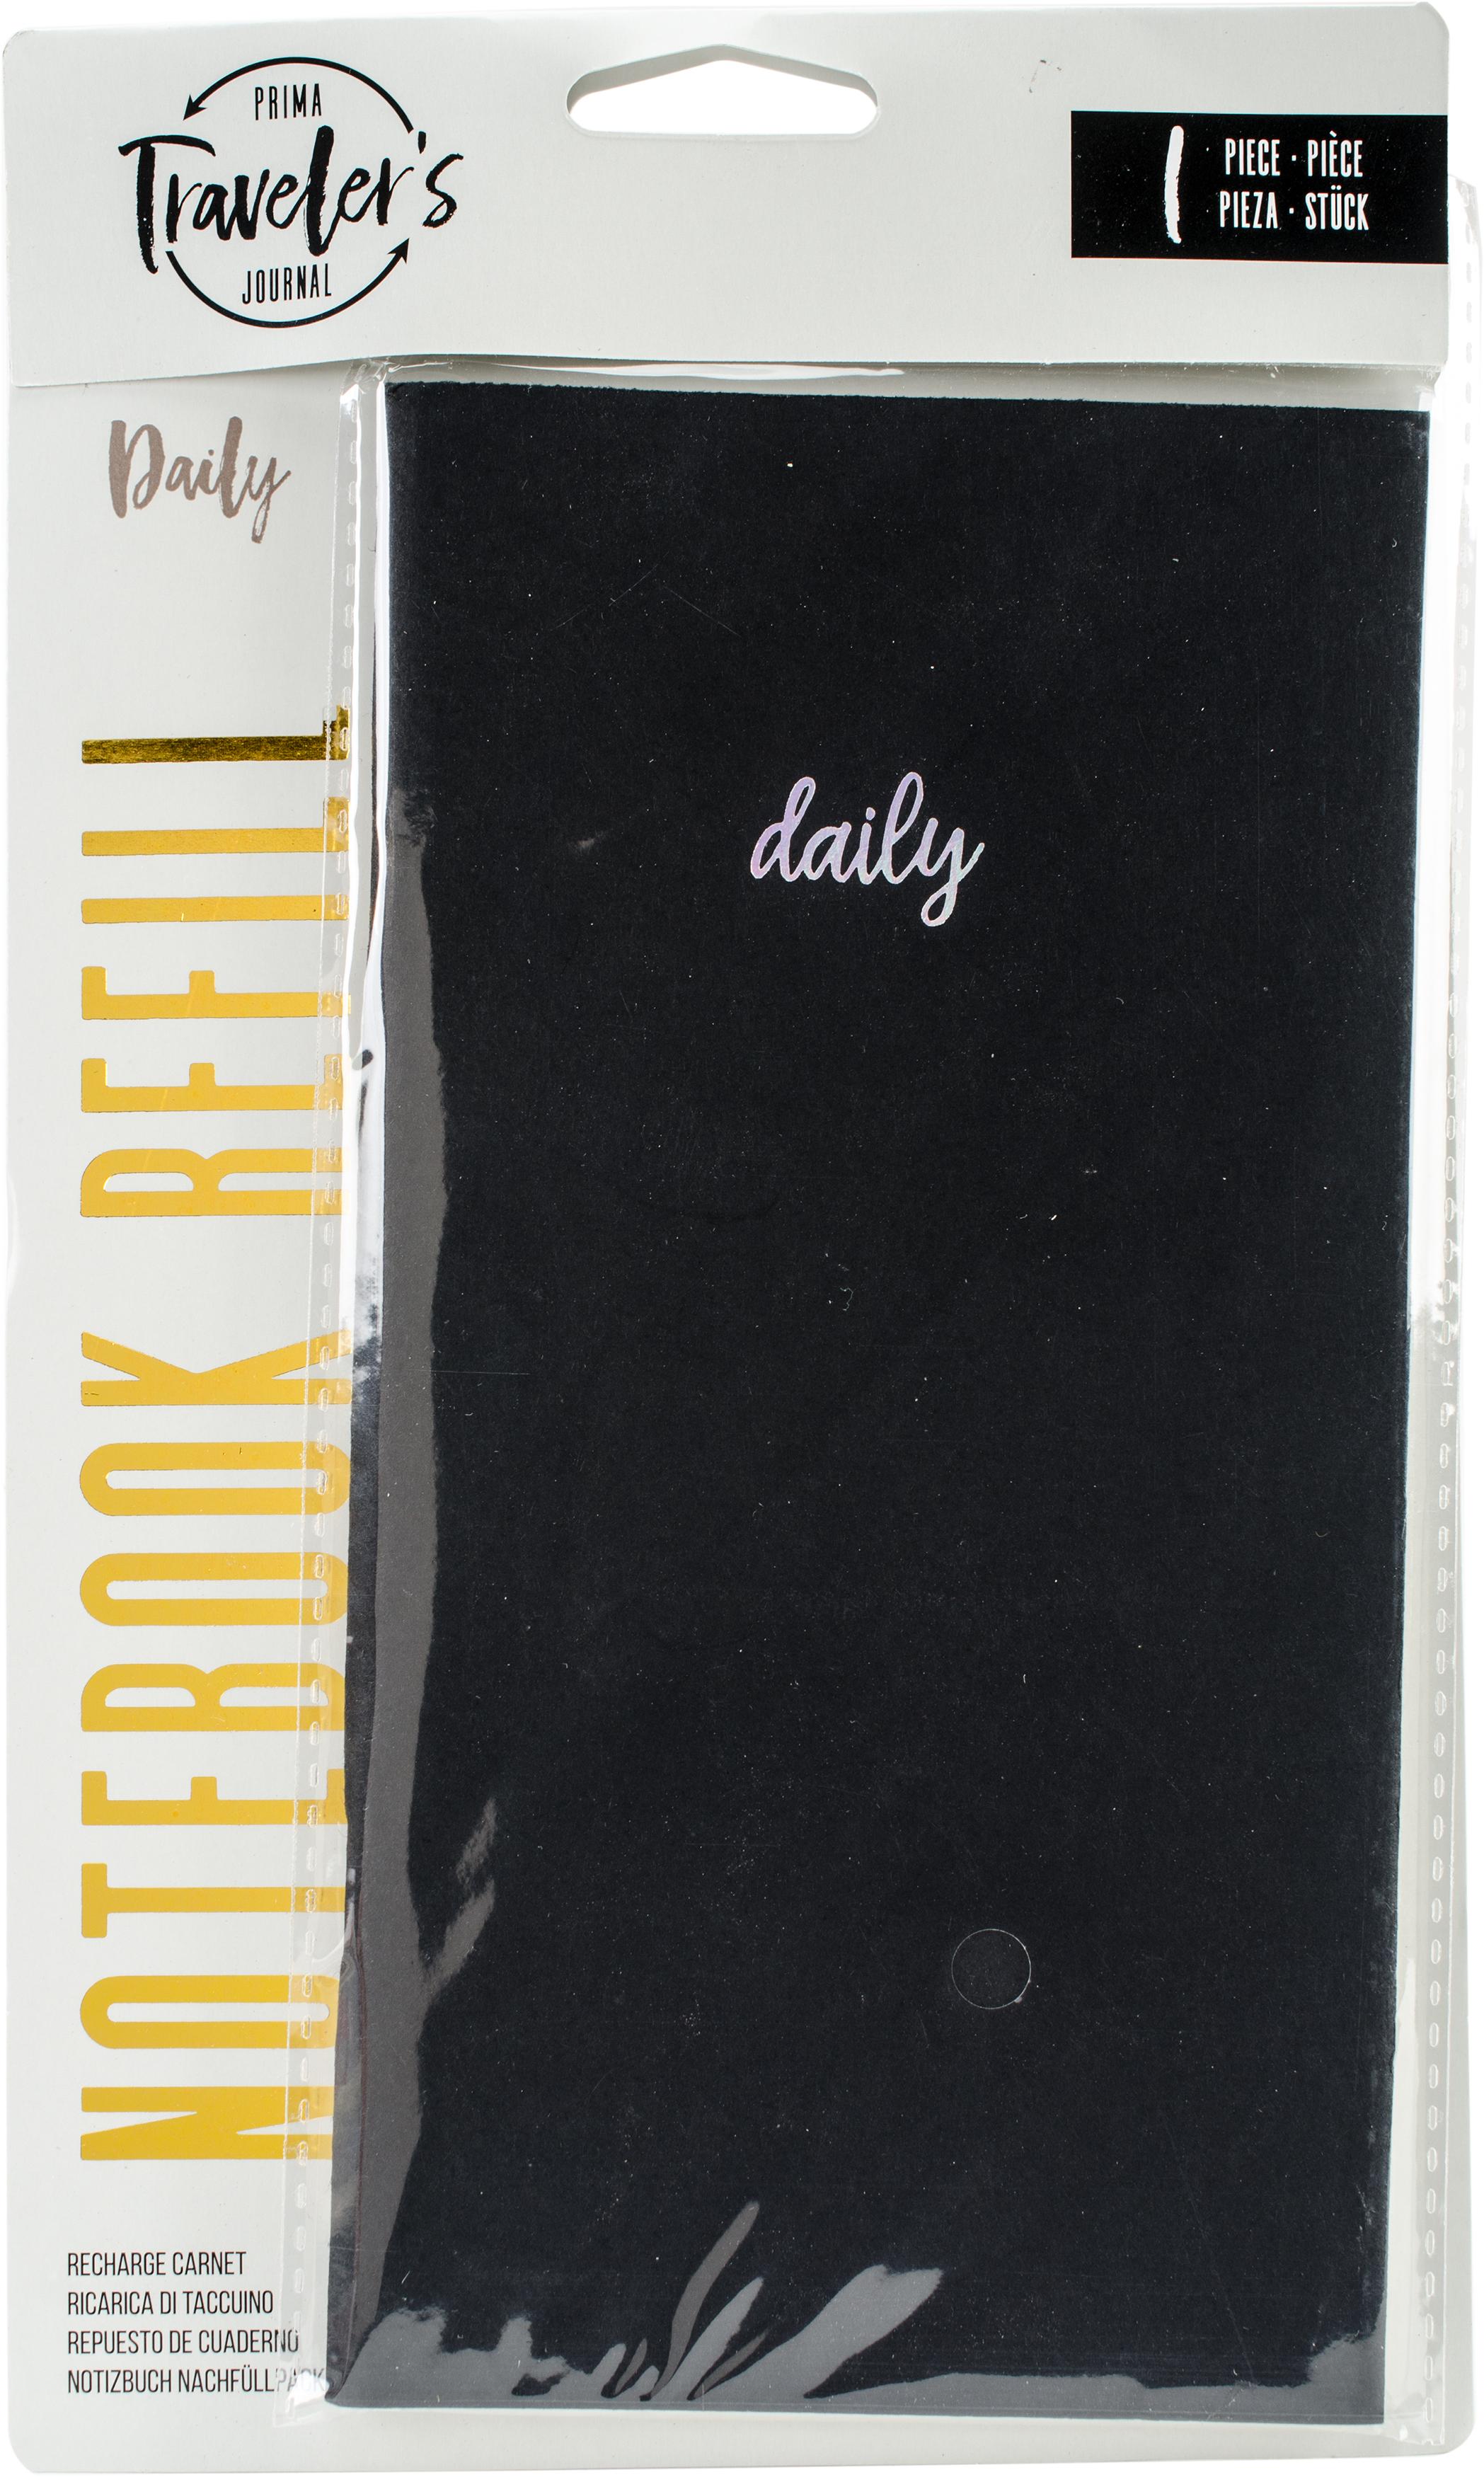 Prima Traveler's Journal Notebook Refill Daily